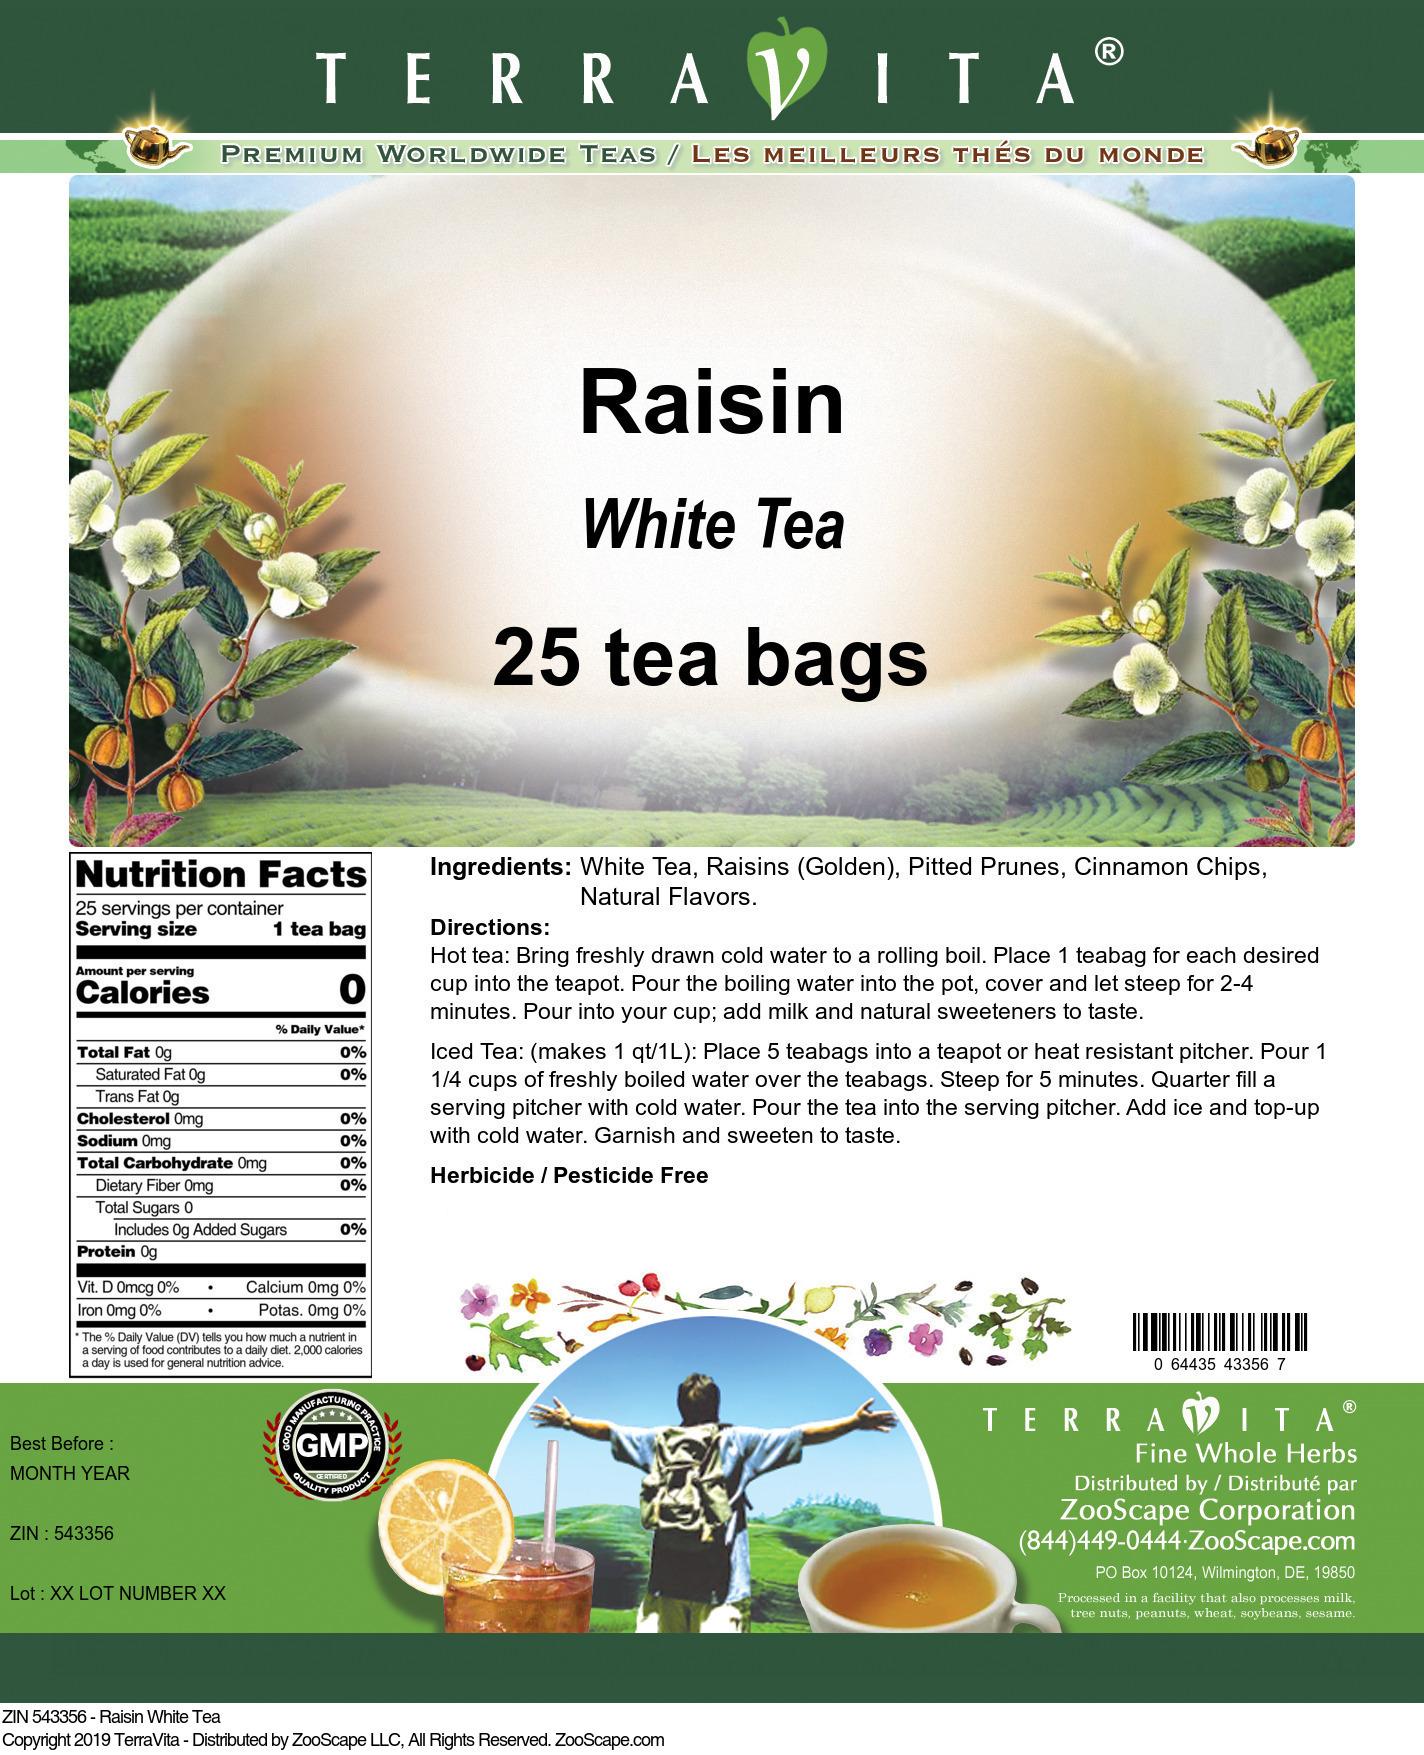 Raisin White Tea